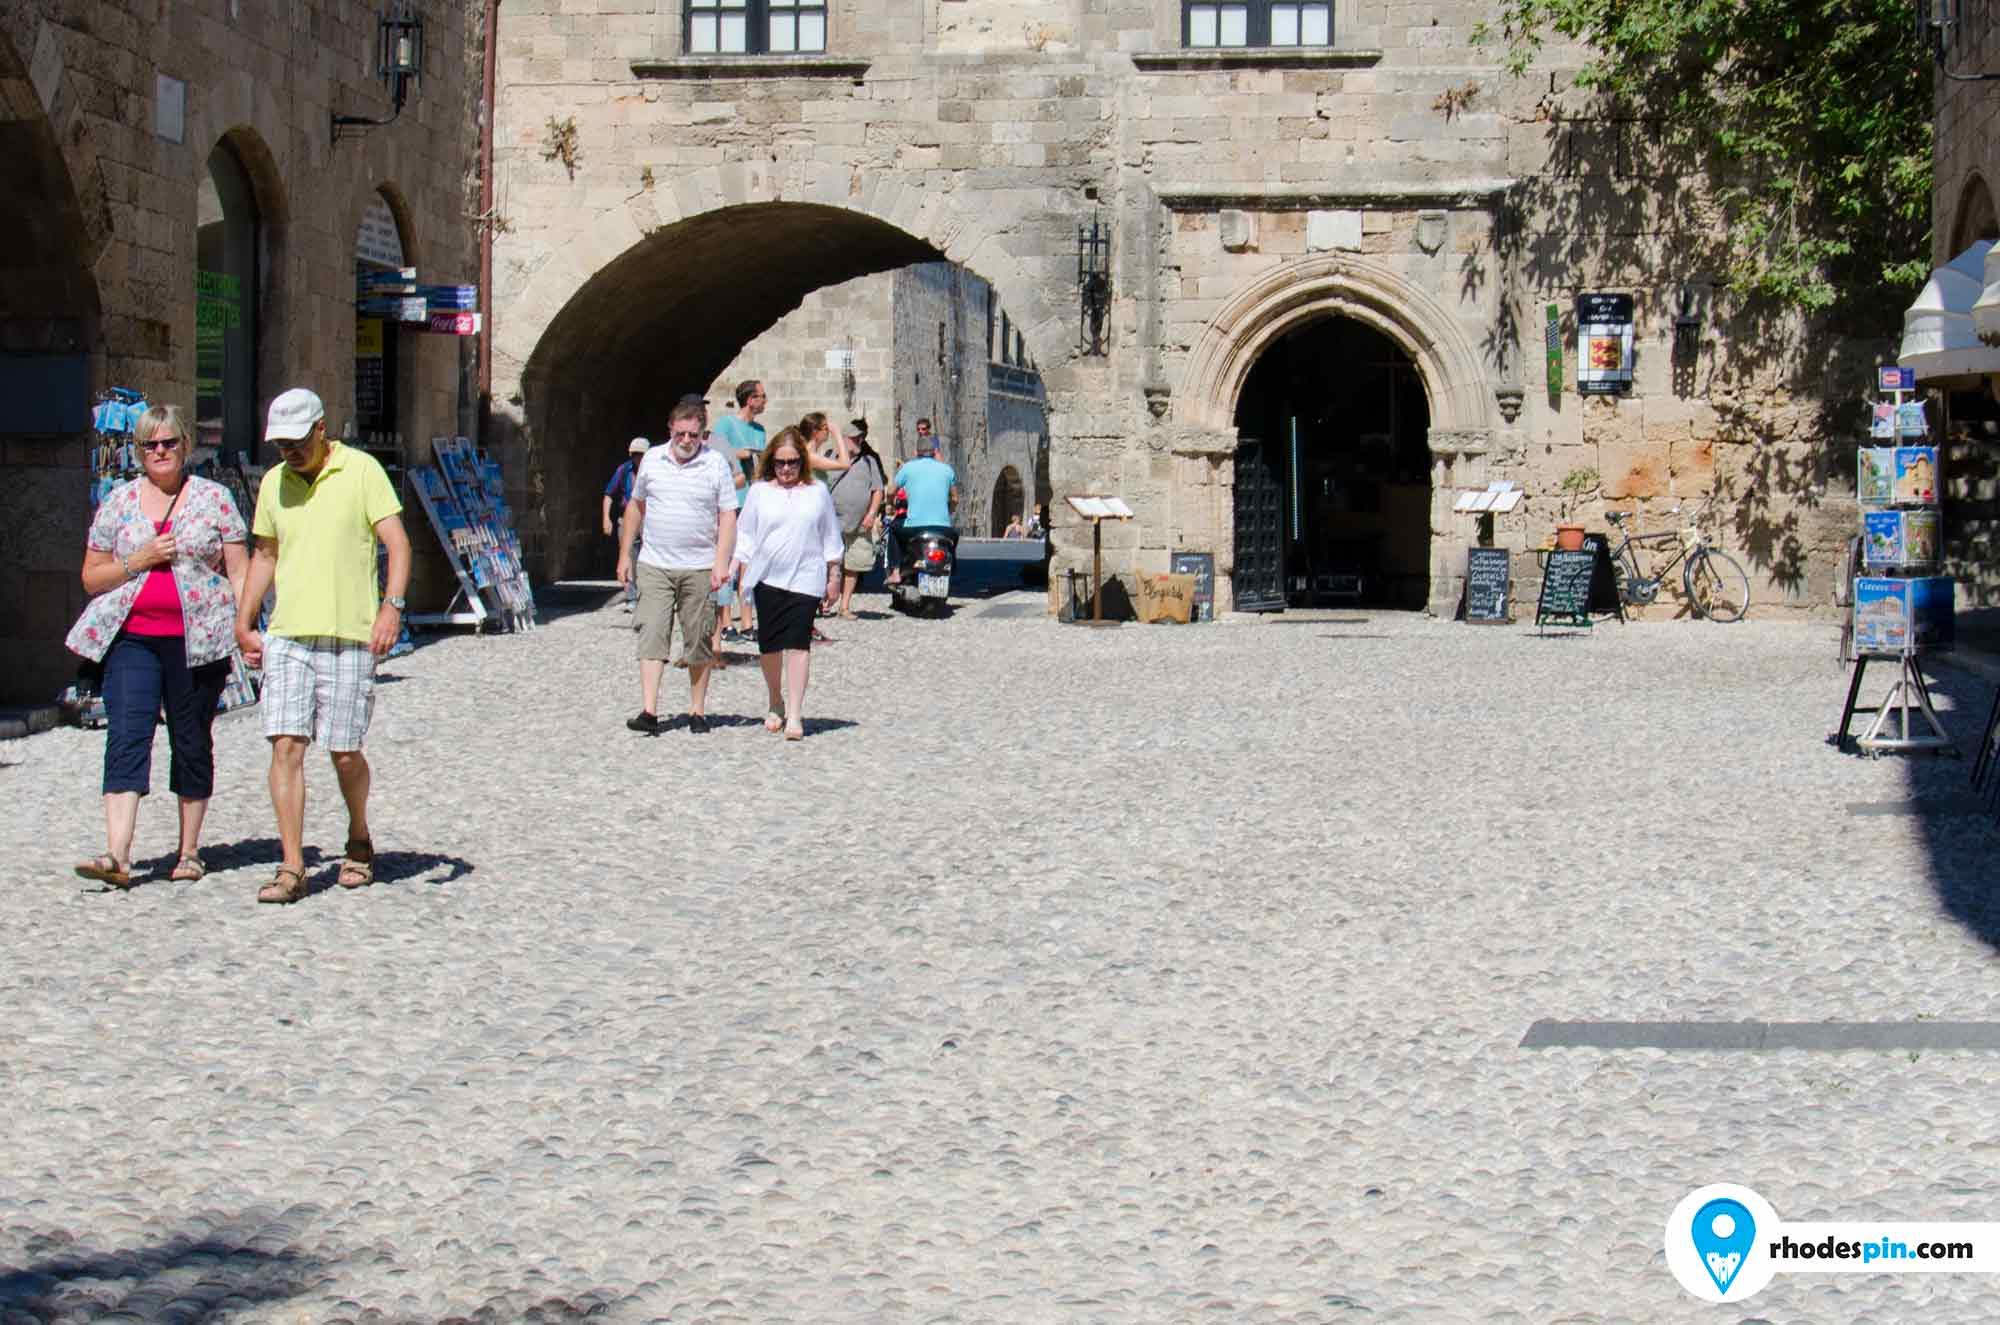 Old town rhodes, old town rodos, medieval rhodes,medieval rodos